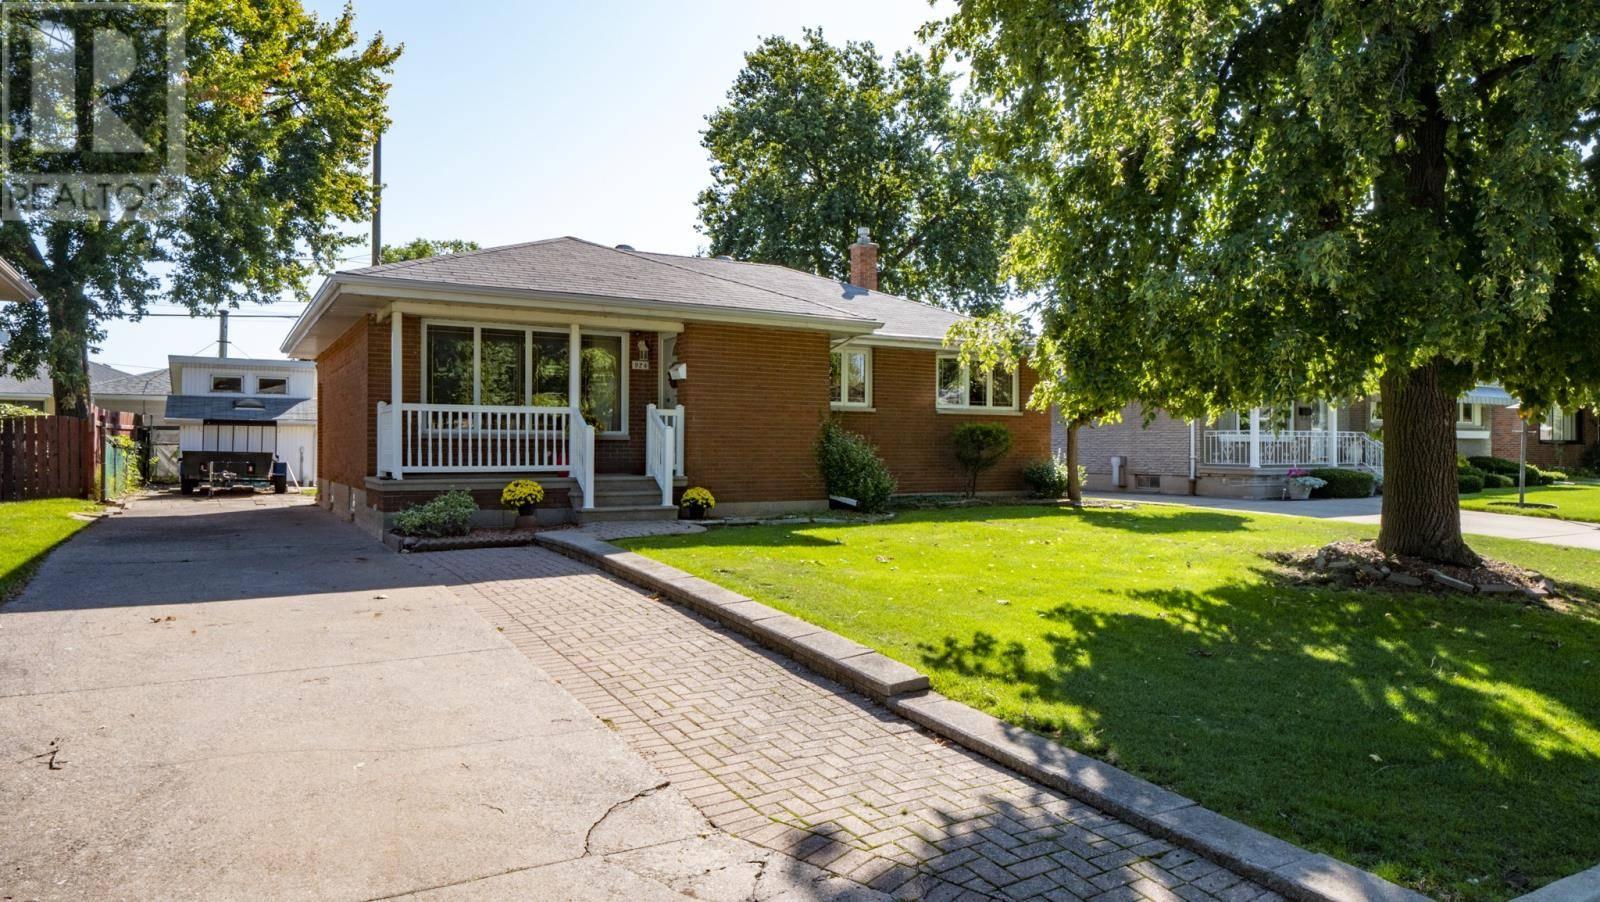 House for sale at 924 Greendale  Windsor Ontario - MLS: 19024975